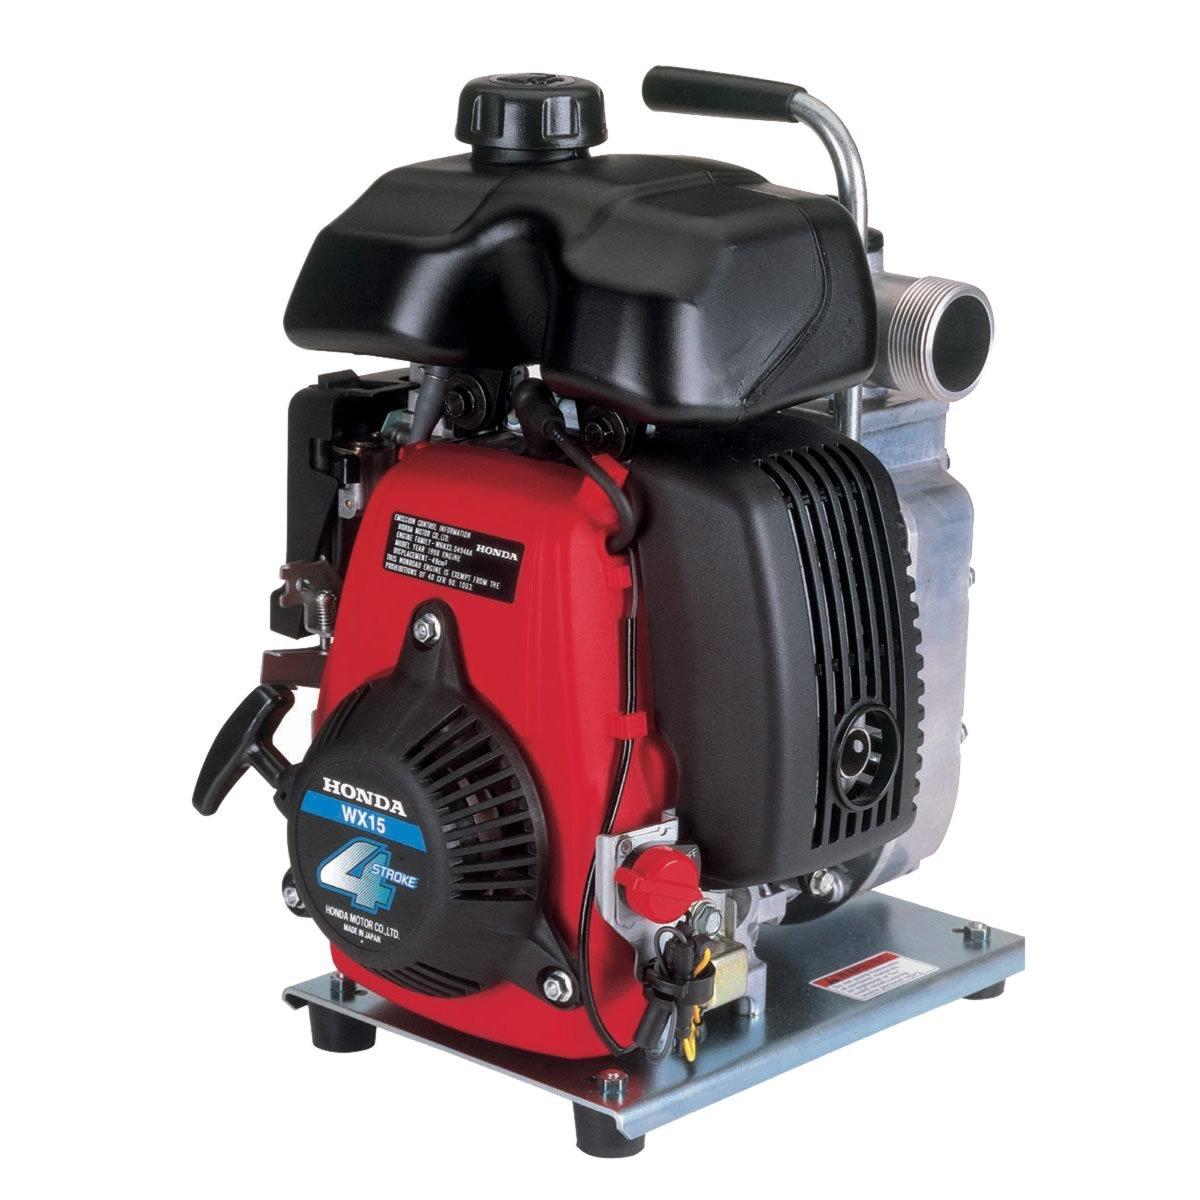 Honda WX15 Lightweight General Purpose Centrifugal Pump, 1.5''